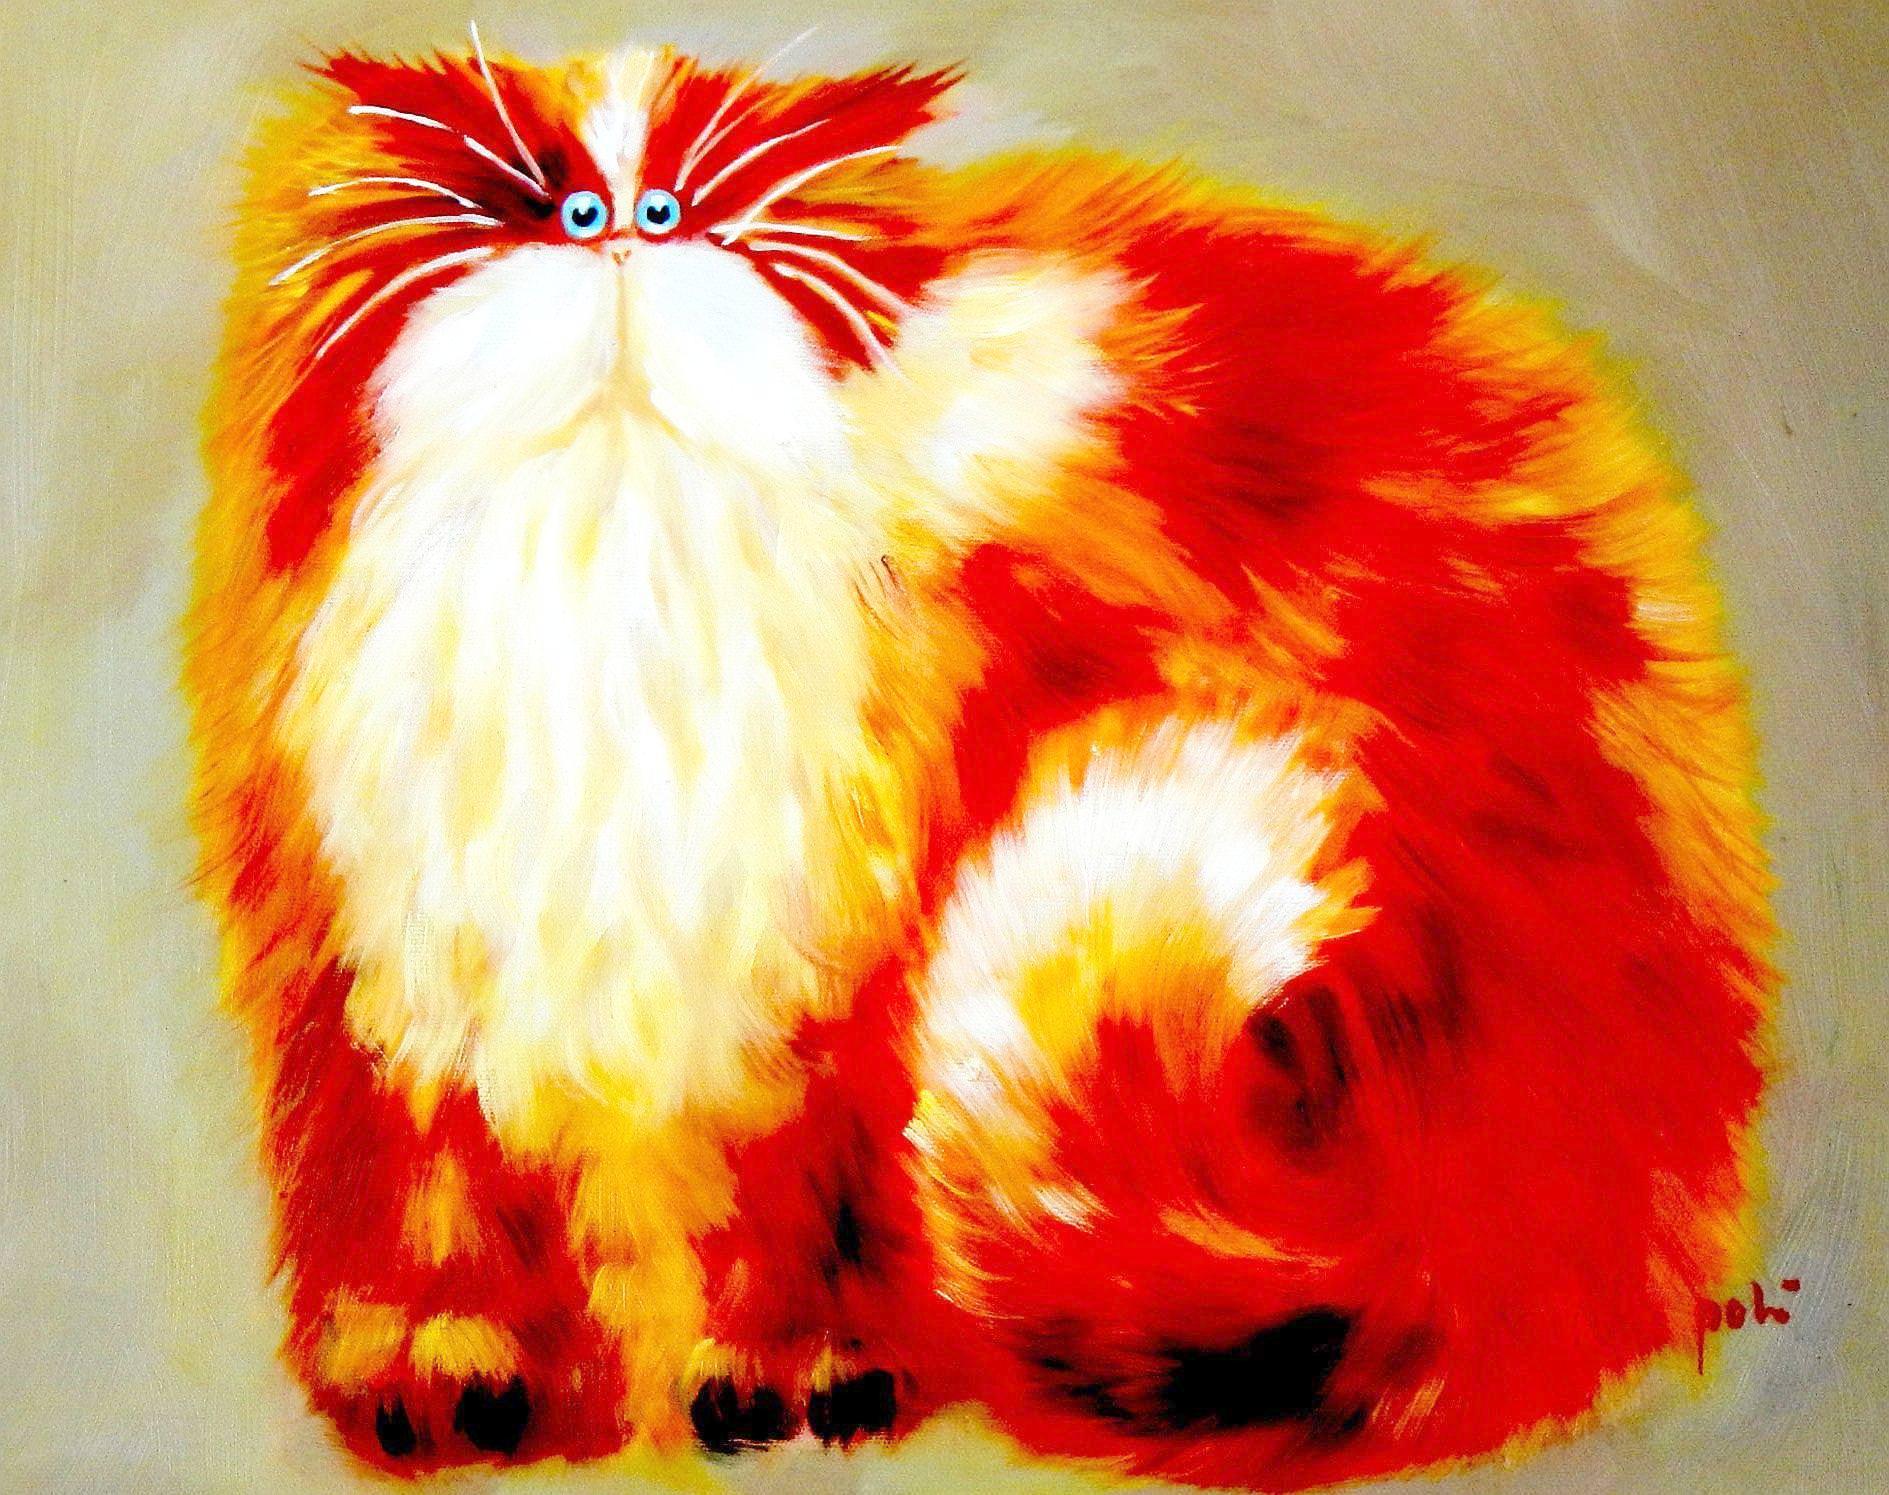 Pop Art - Pummel Kater Garfield a93864 30x40cm lustiges Ölbild handgemalt